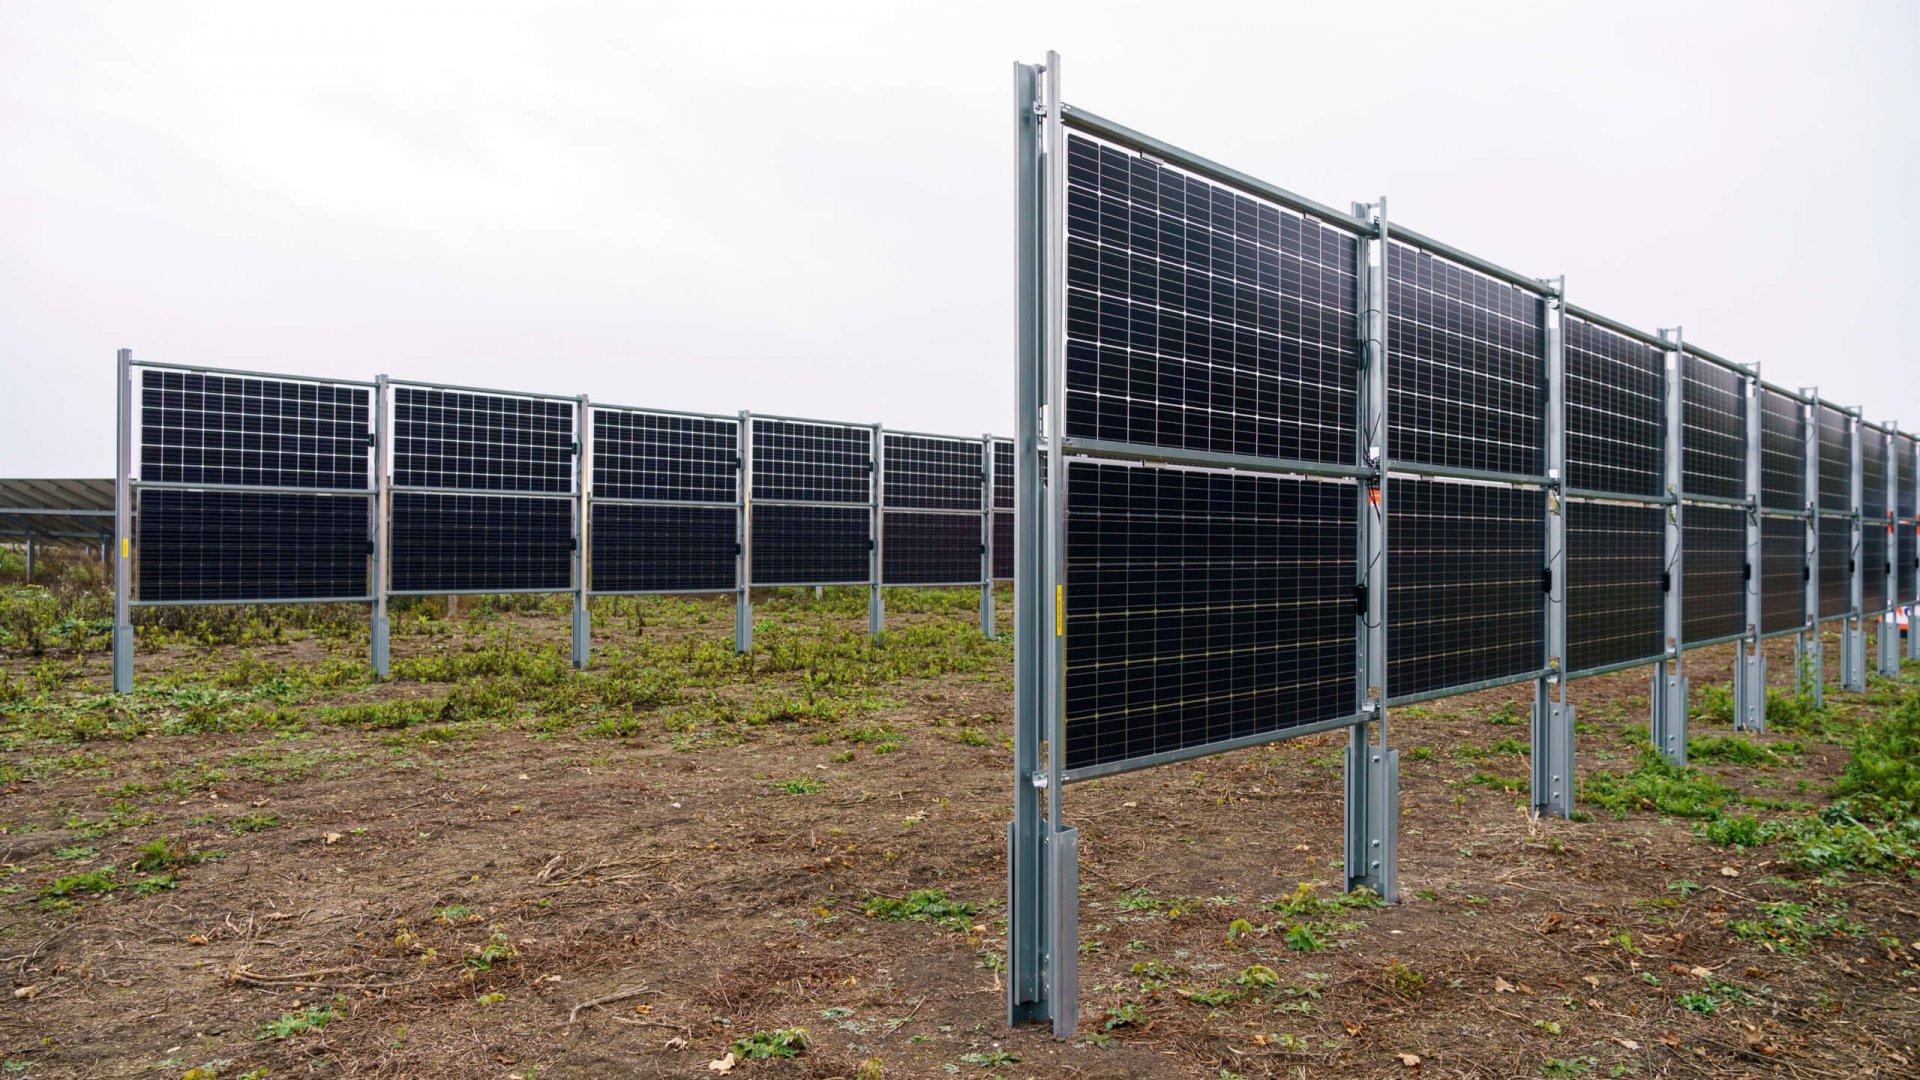 Agricultural PV-Plant Guntramsdorf (Austria), Source: Wien Energie / Christian Hofer